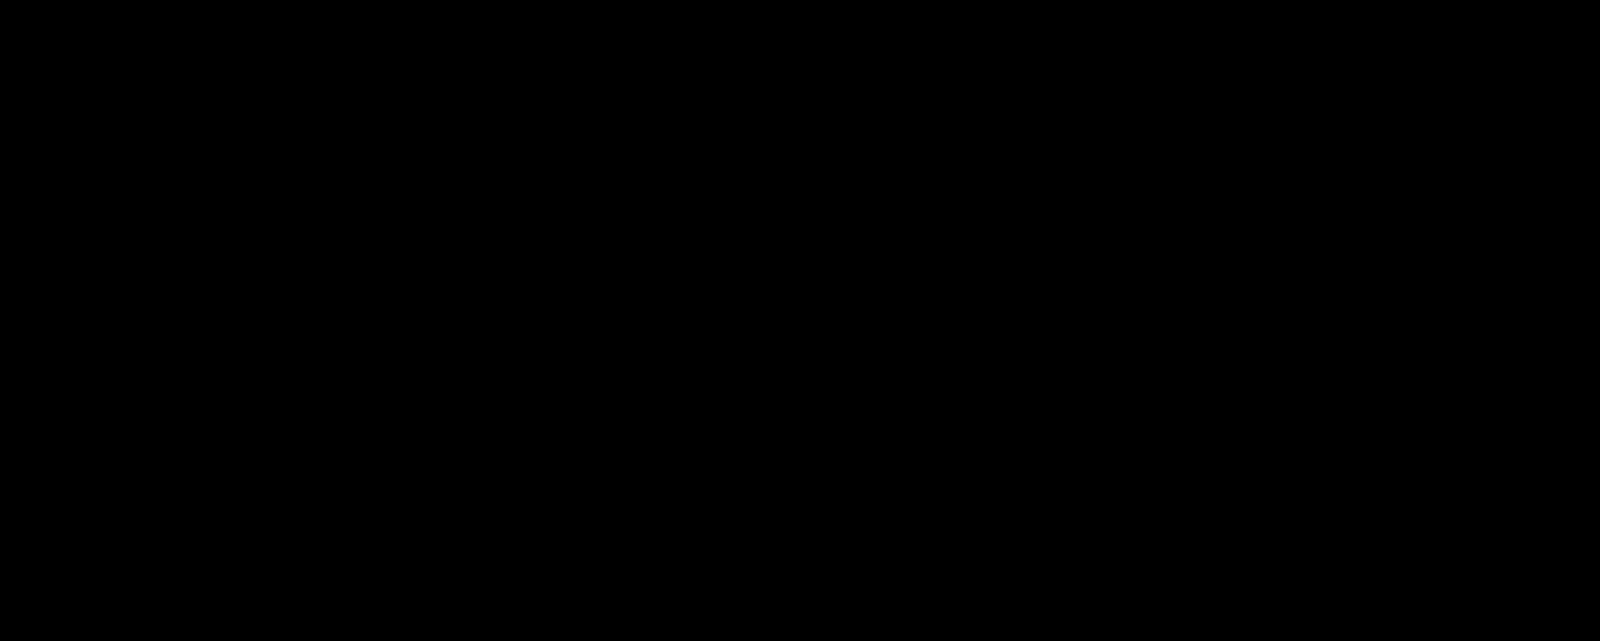 Logo mes courses en vrac